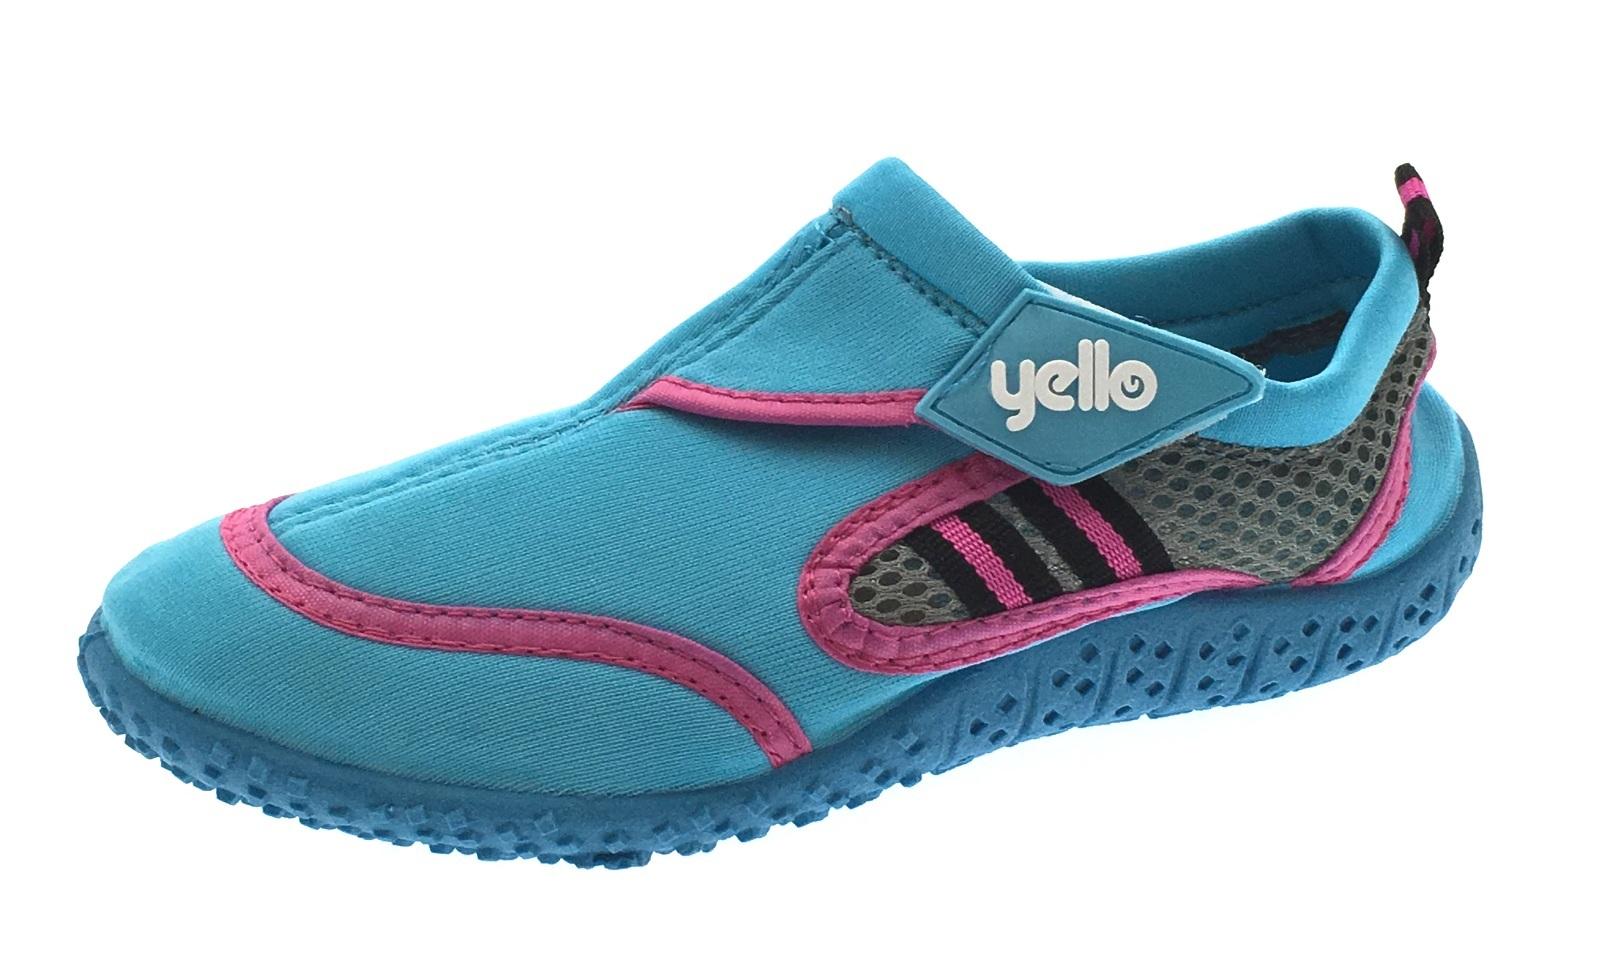 Womens S Urban Beach Water Aqua Socks Shoes